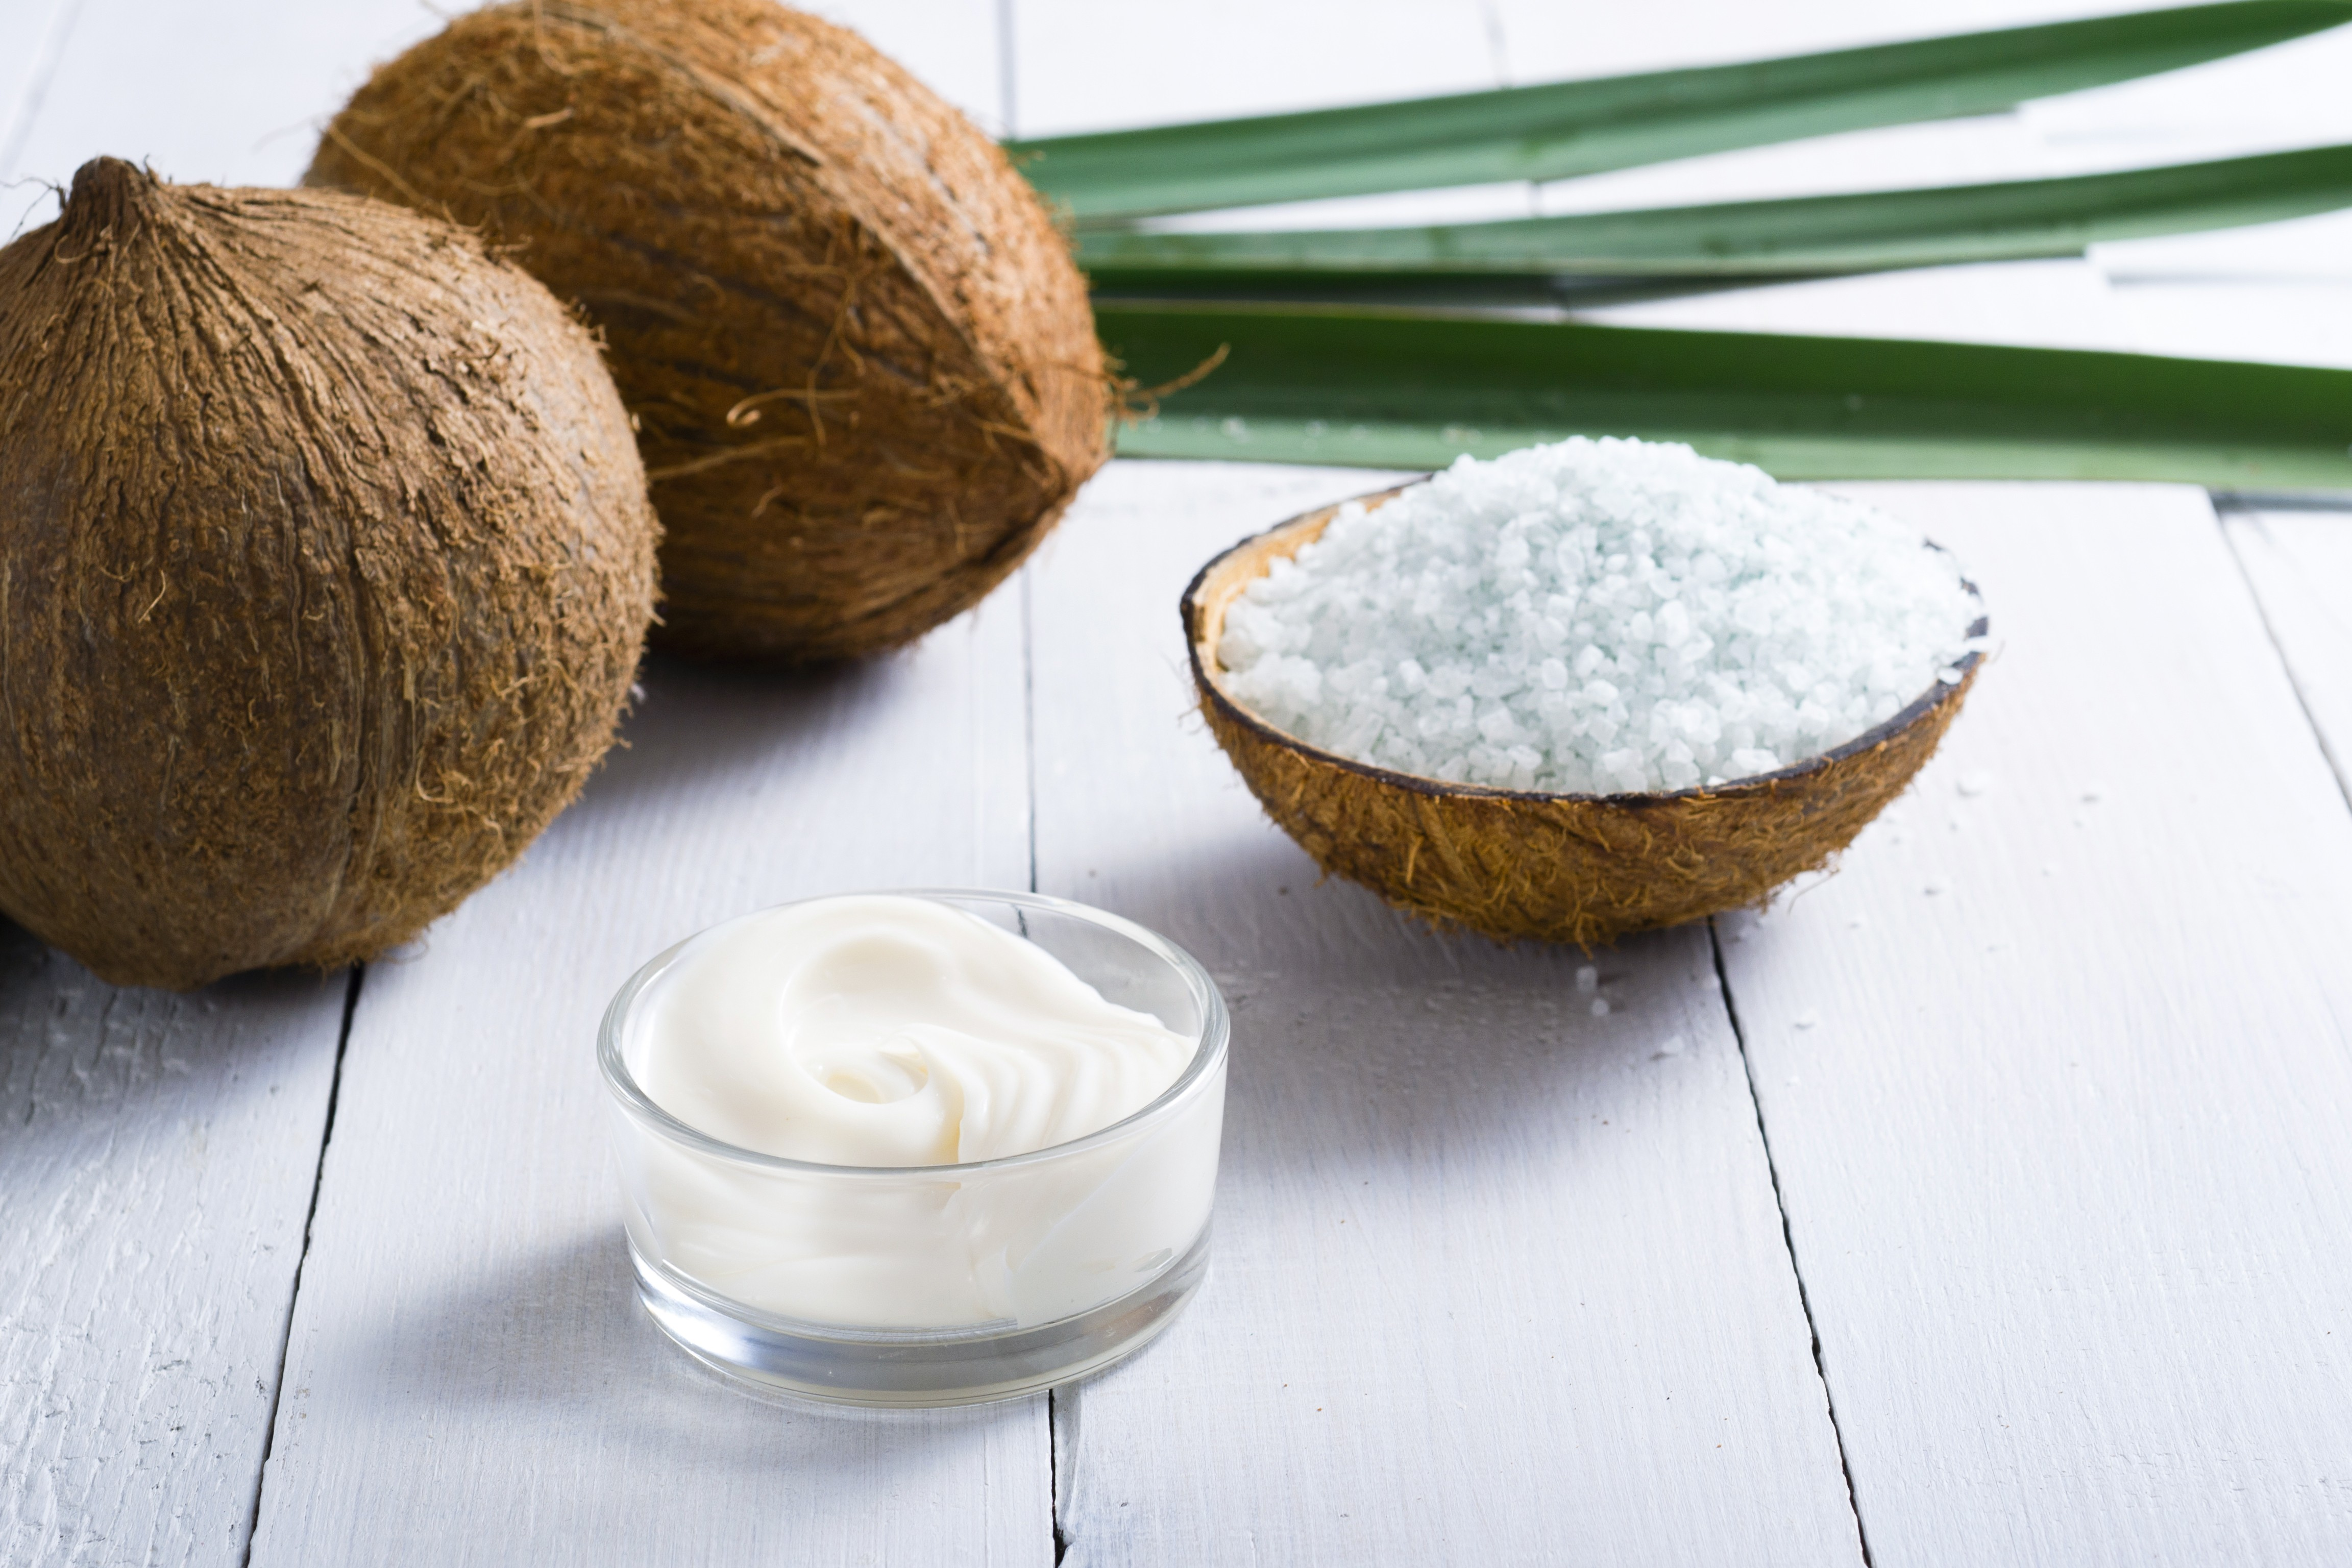 Ococonut-image-2